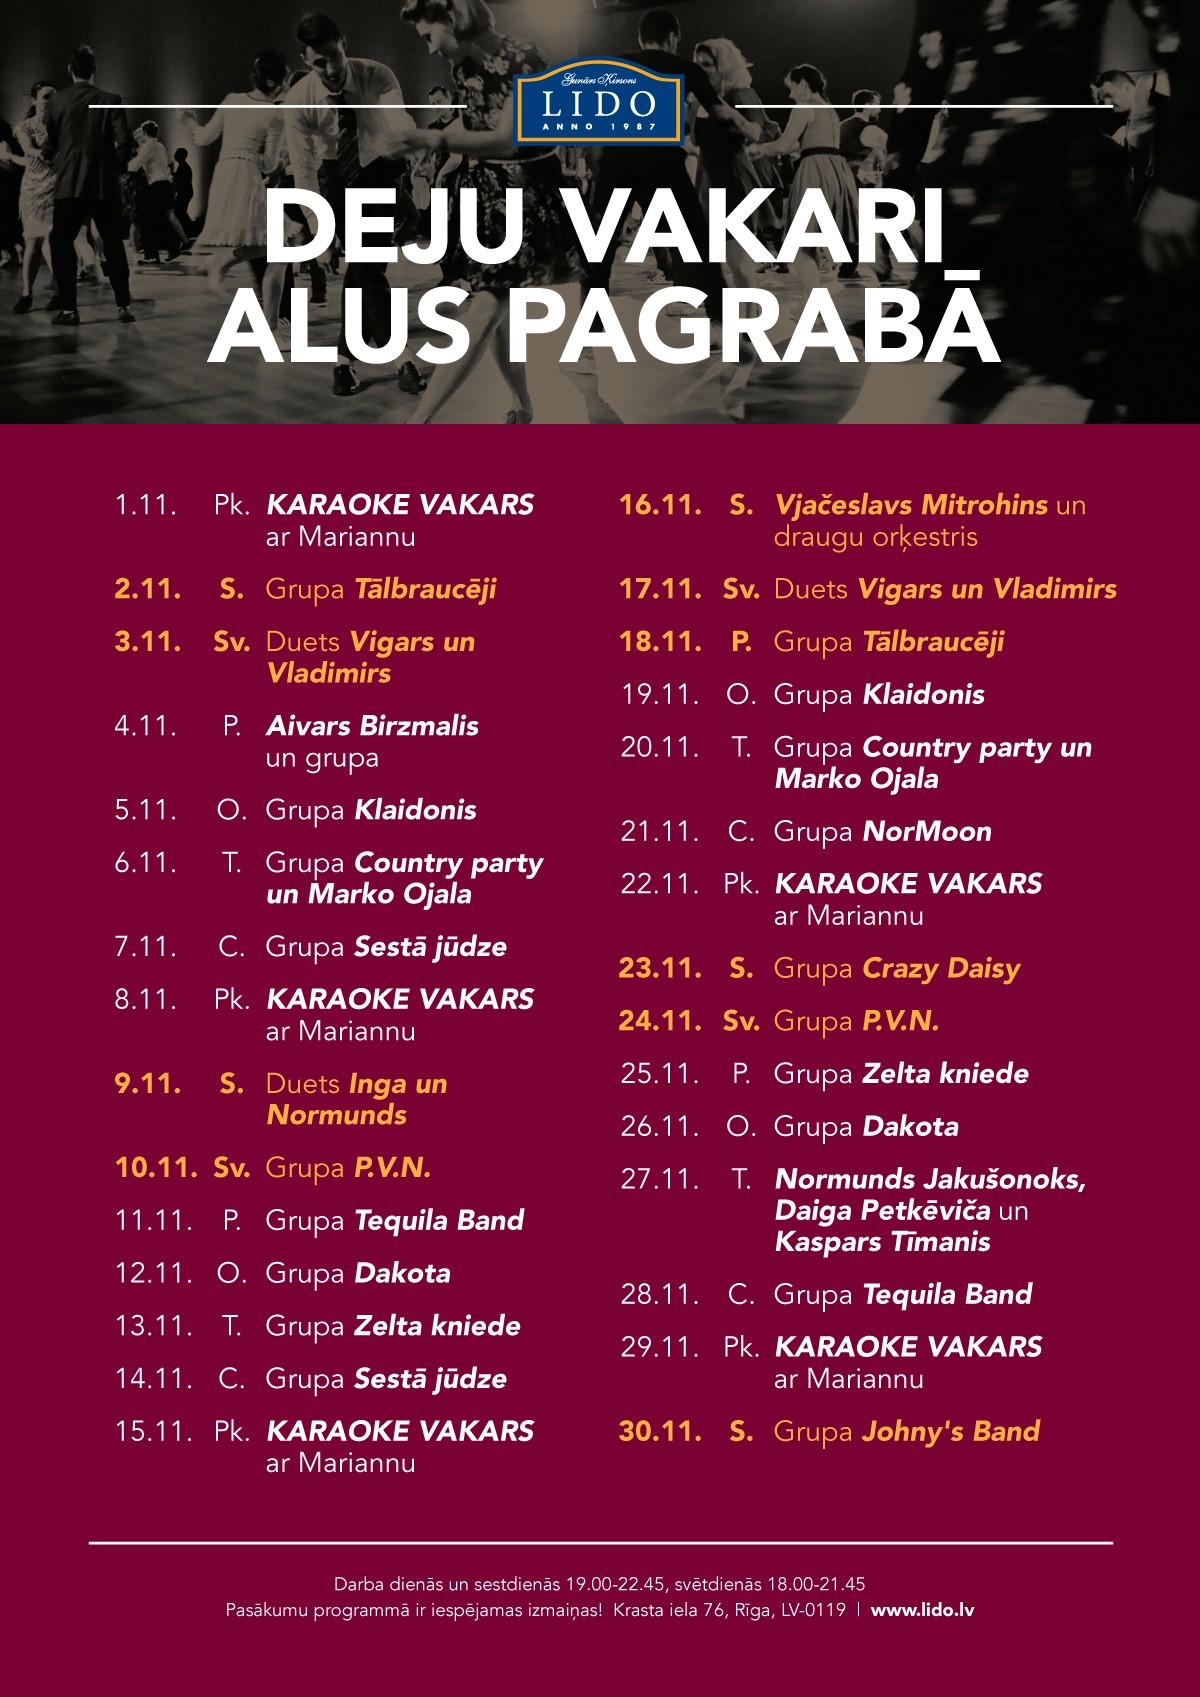 DejuVakariPagrabs-Novembris-A4-10.2019.jpg